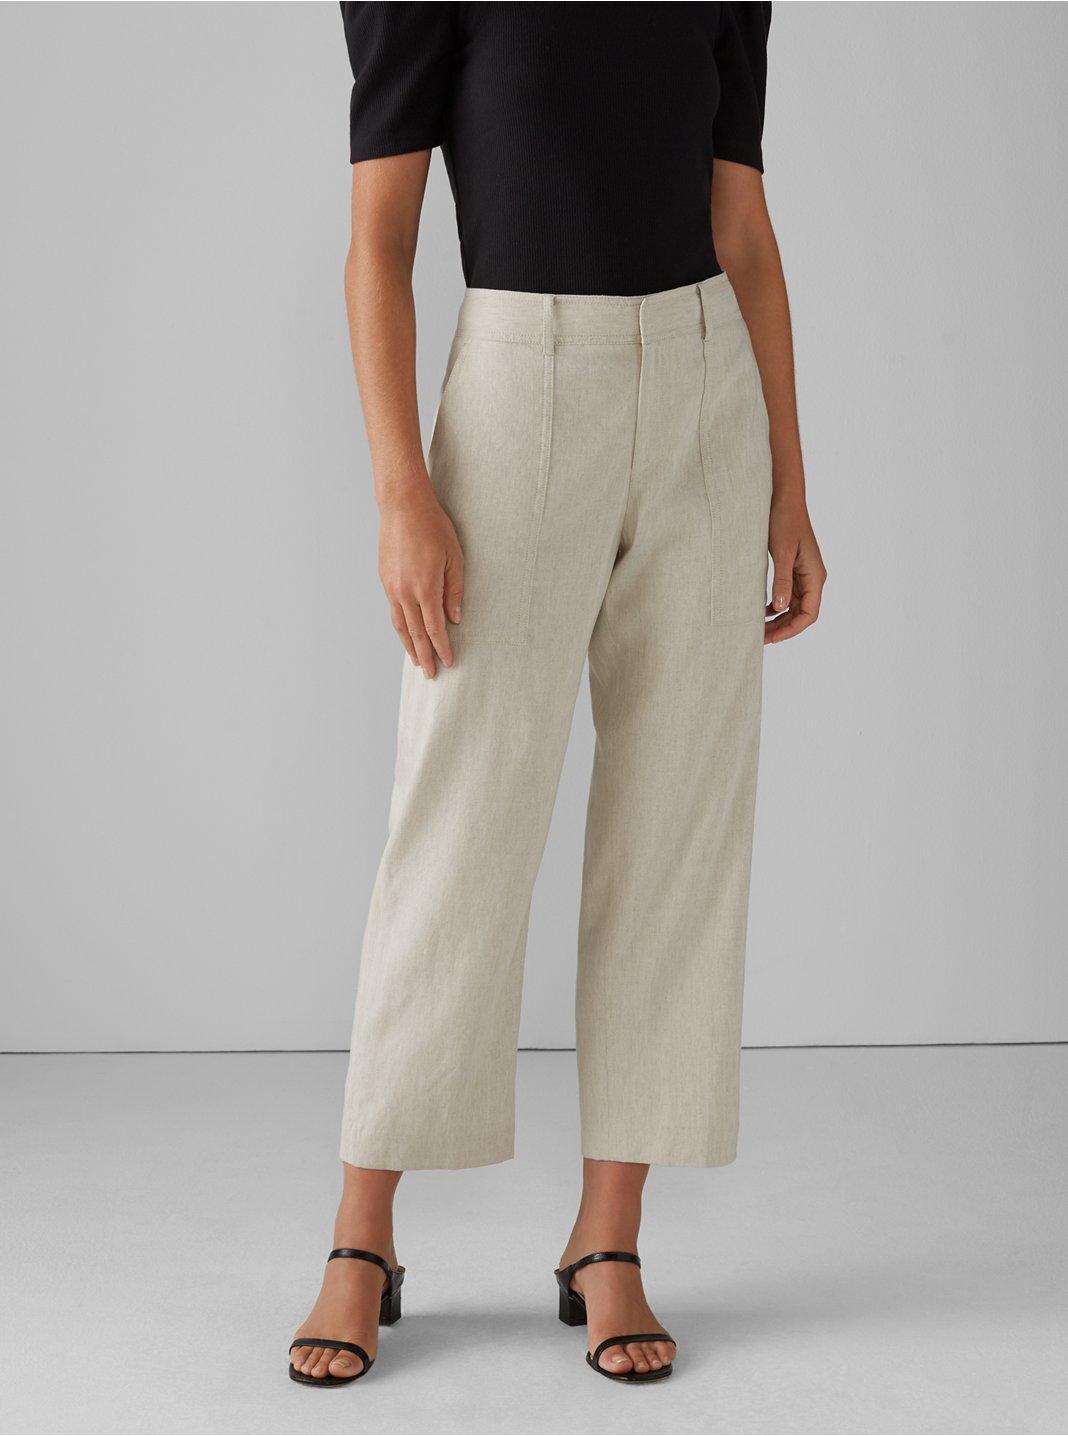 Hadarahh Linen-Blend Pant